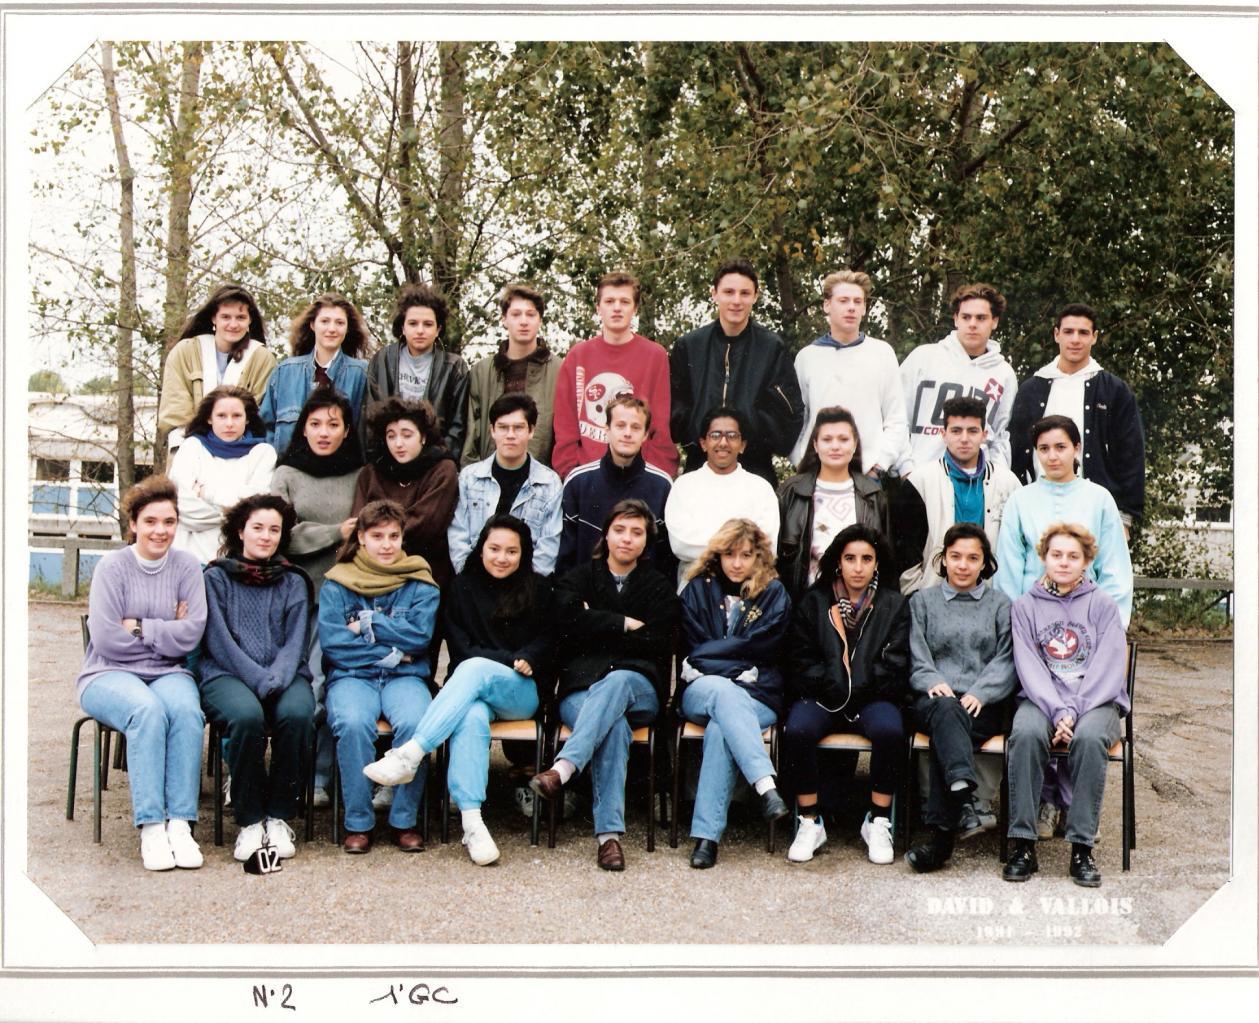 1992 - 1GC